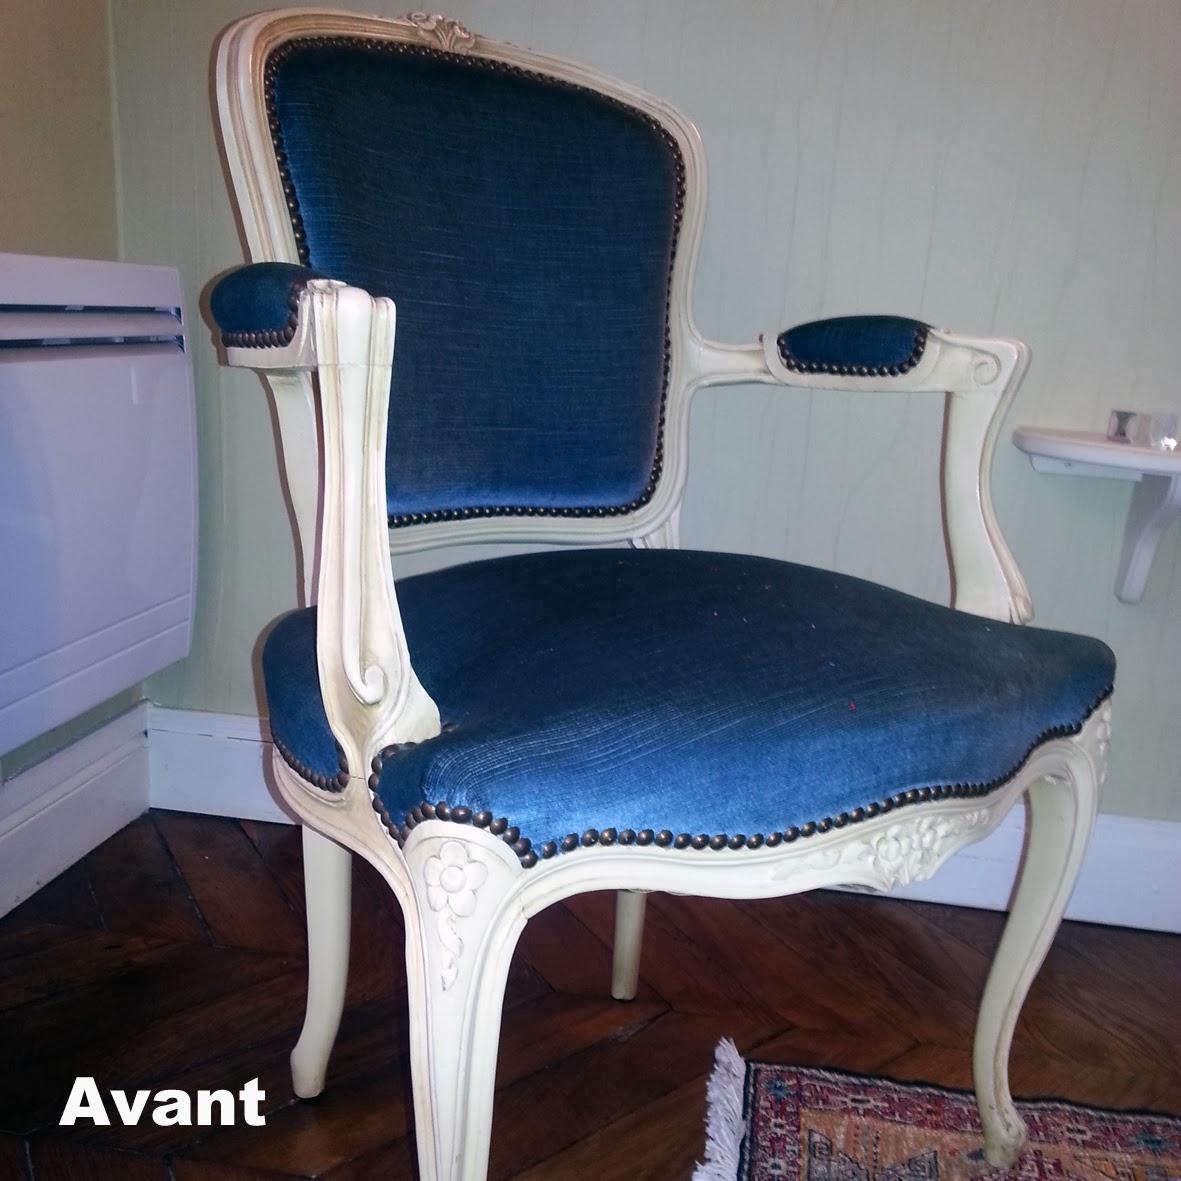 avant apr s cabriolet louis xv atelier velvet. Black Bedroom Furniture Sets. Home Design Ideas